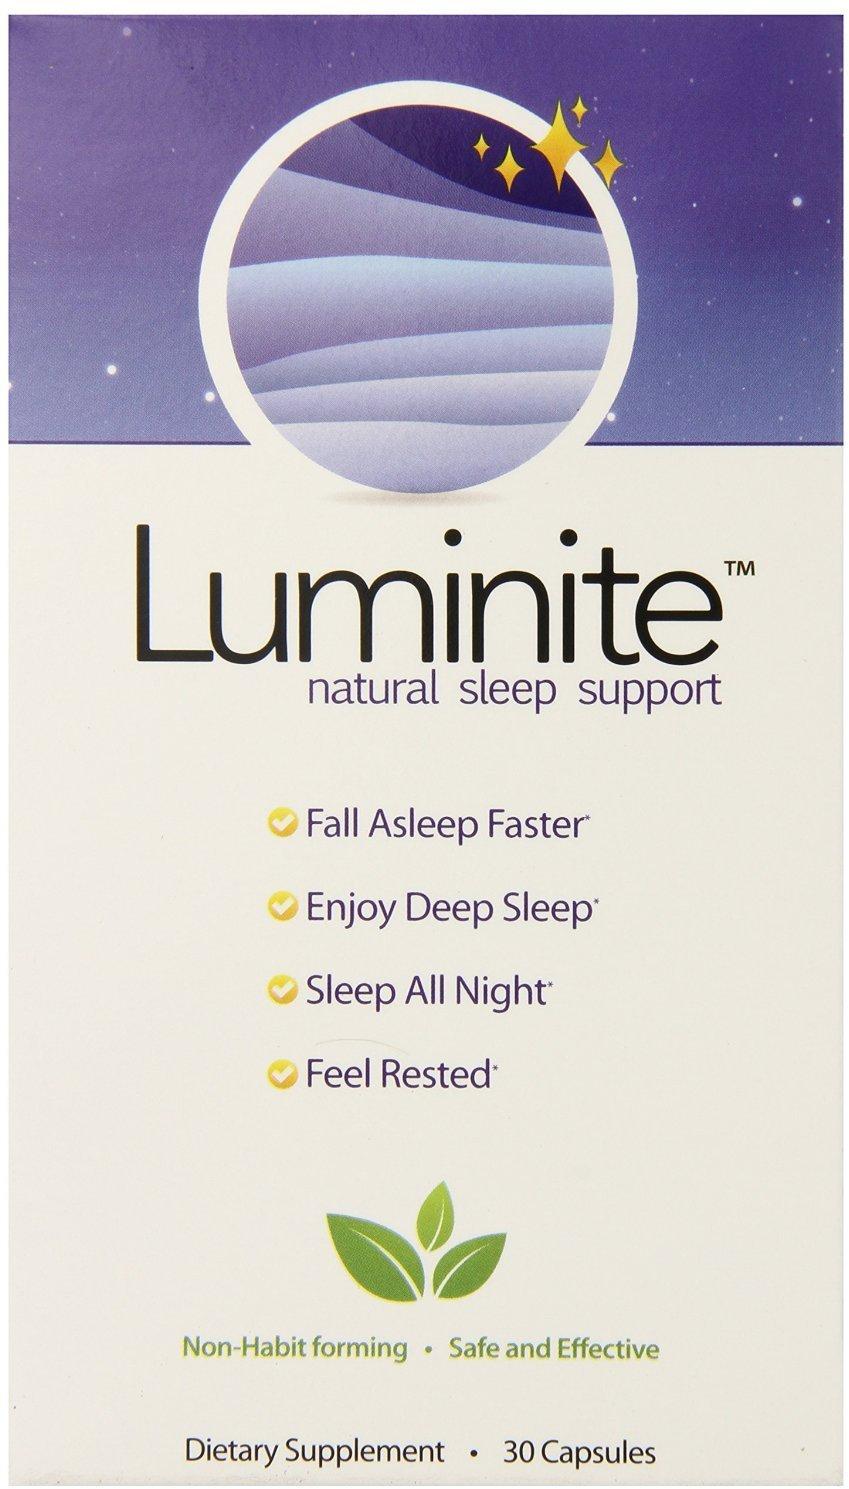 Luminite Natural Sleep Support Reviews